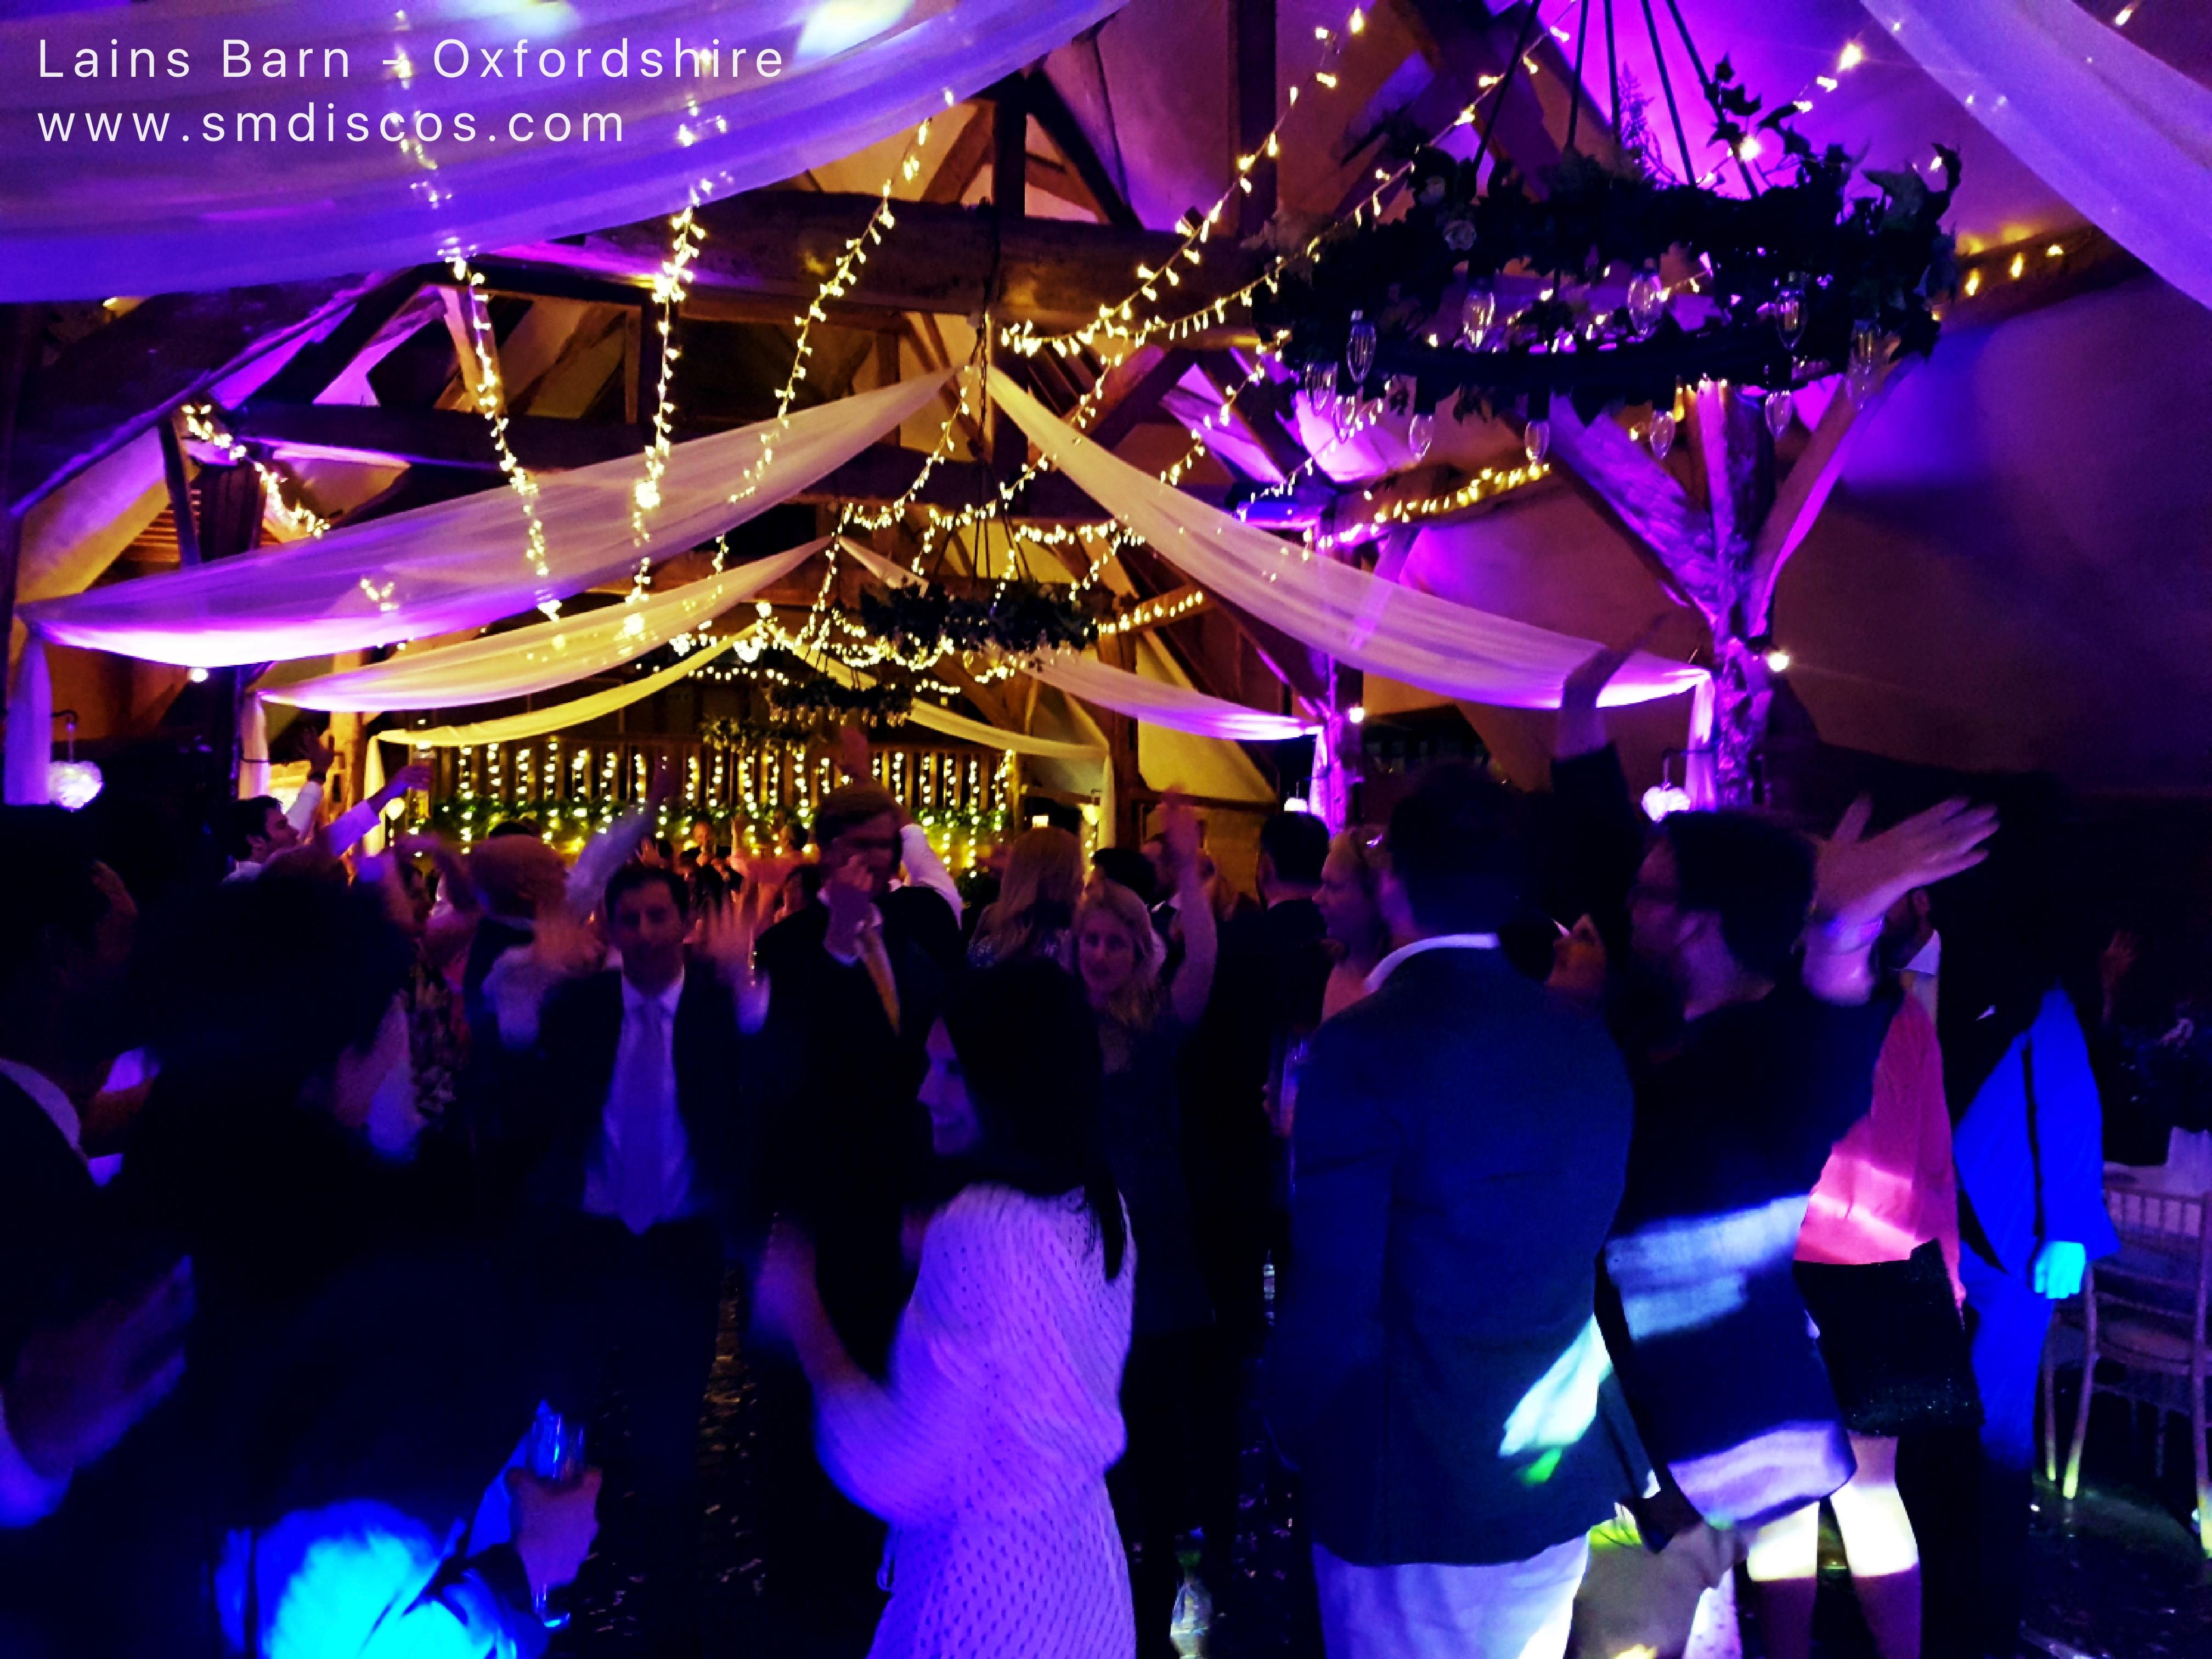 LAINS BARN WEDDING DJ